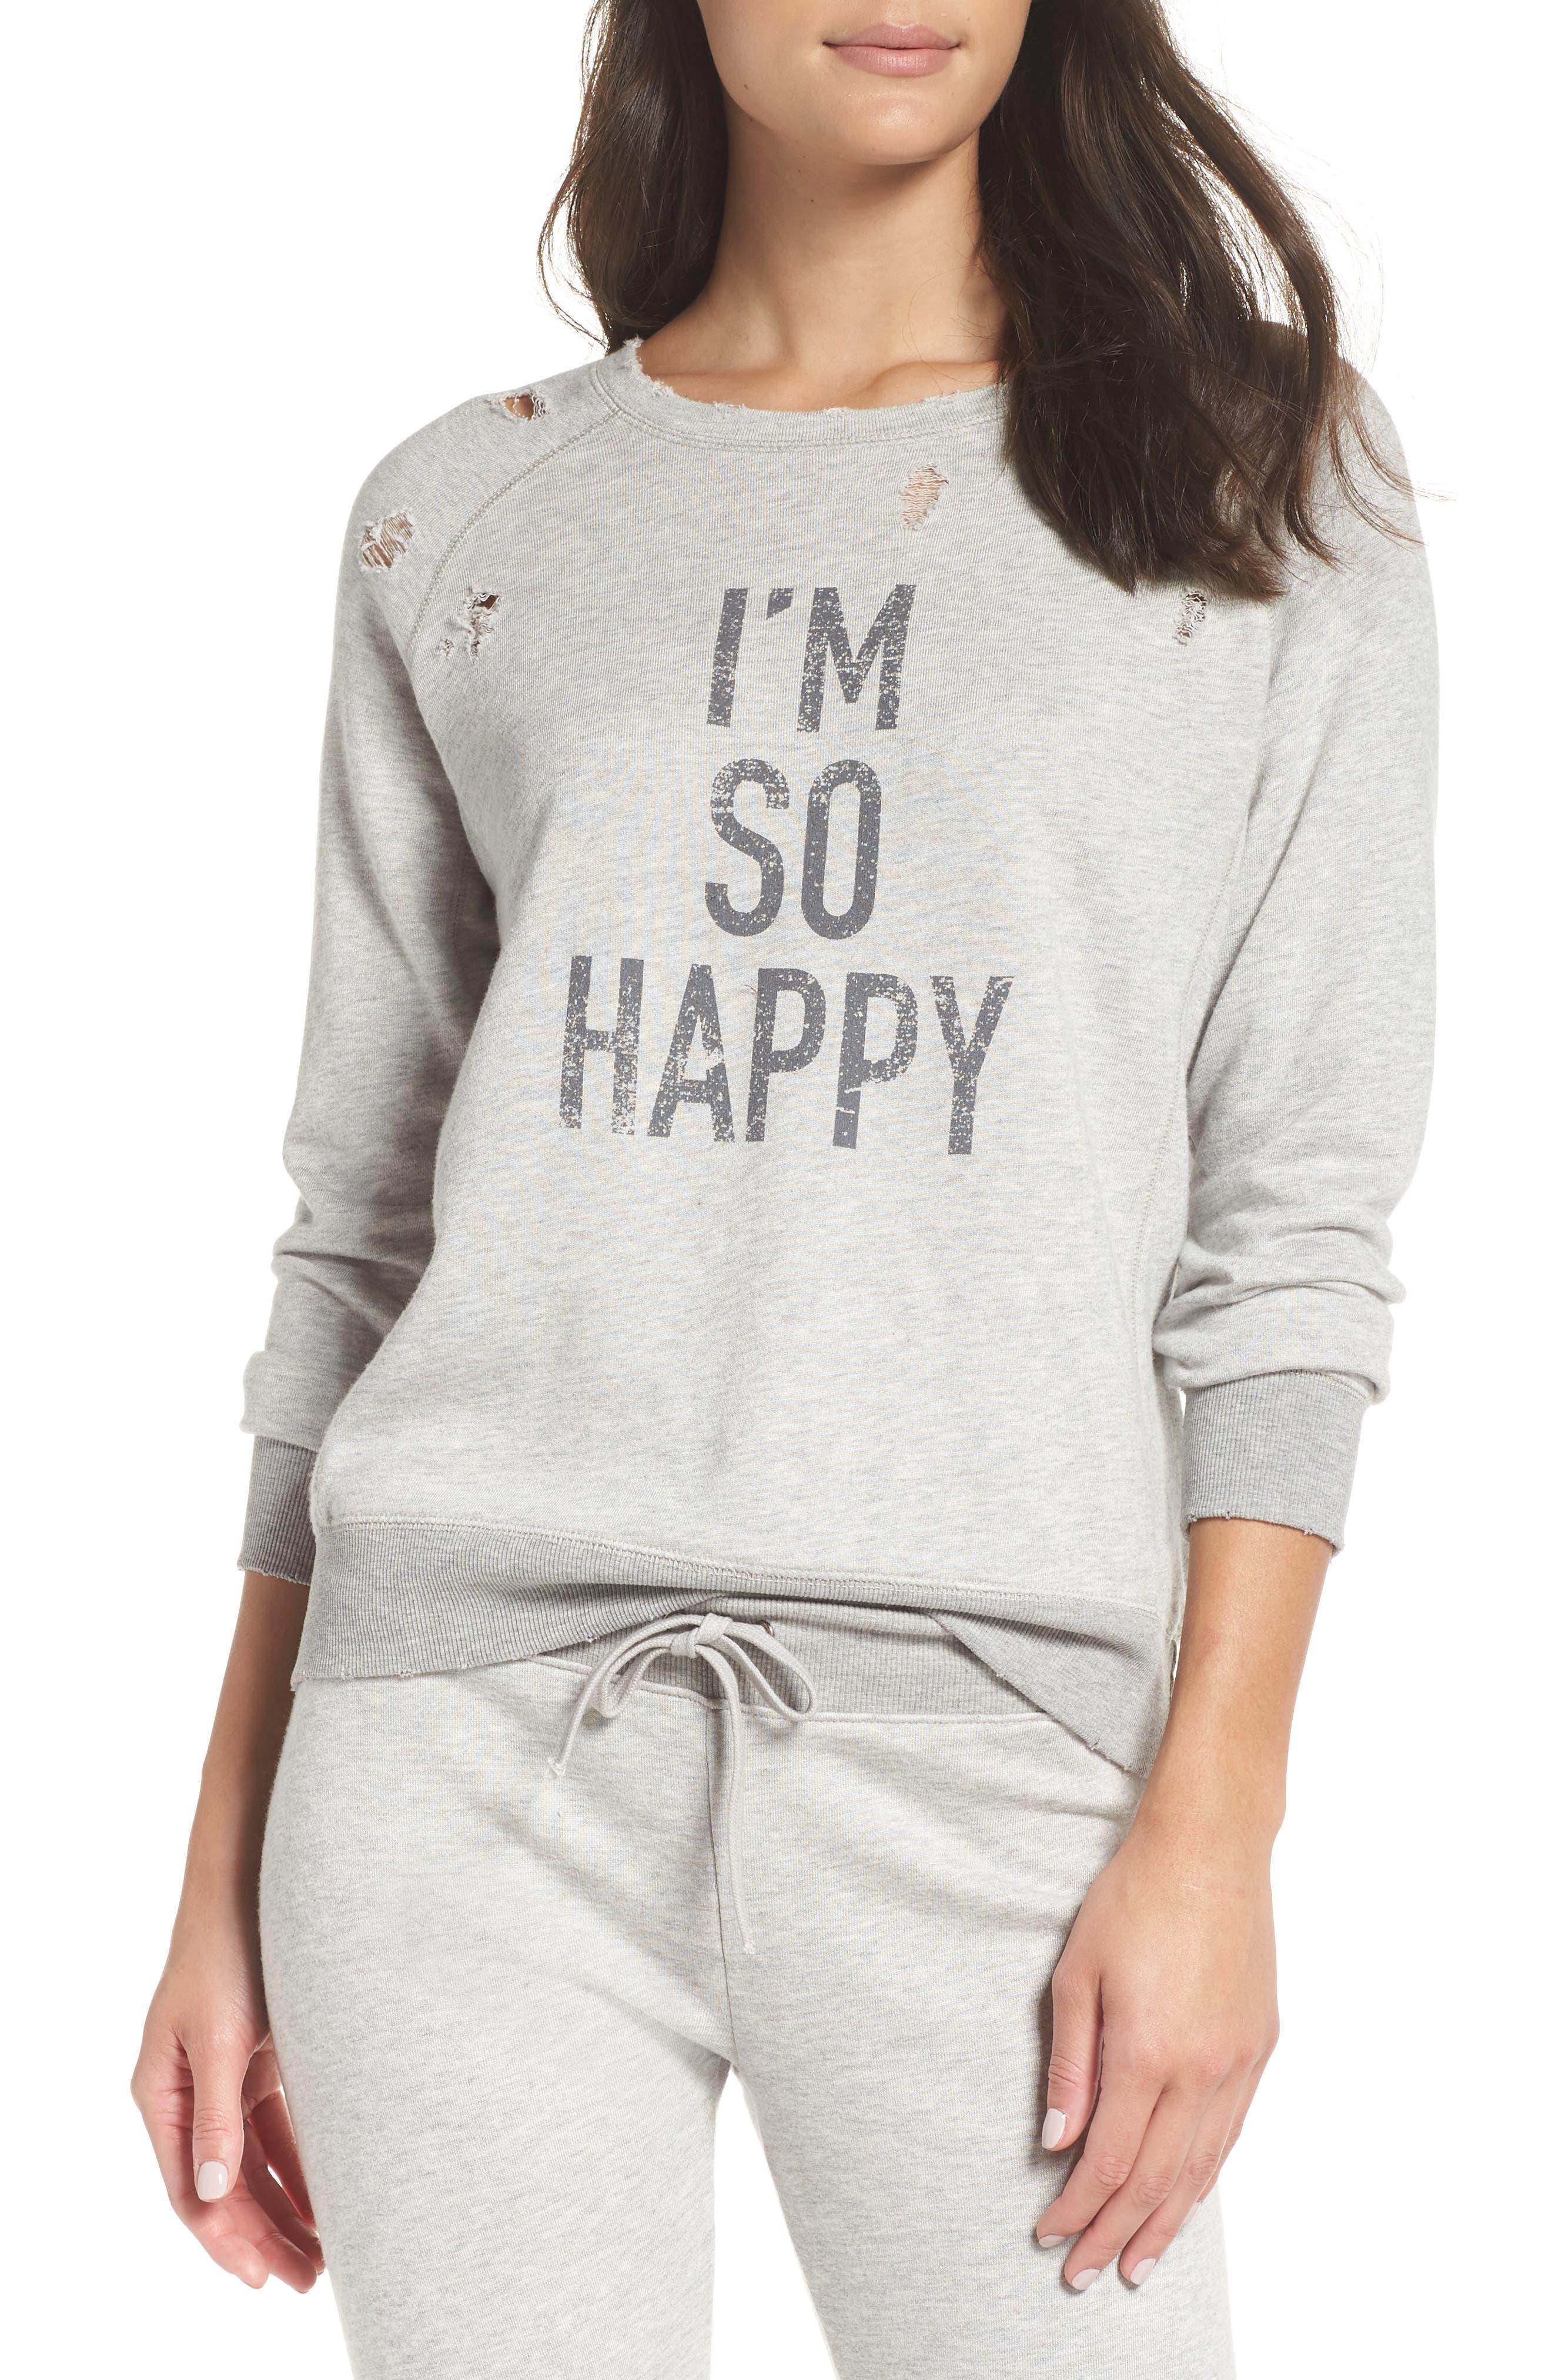 DAVID LERNER I'M So Happy Distressed Sweatshirt in Grey